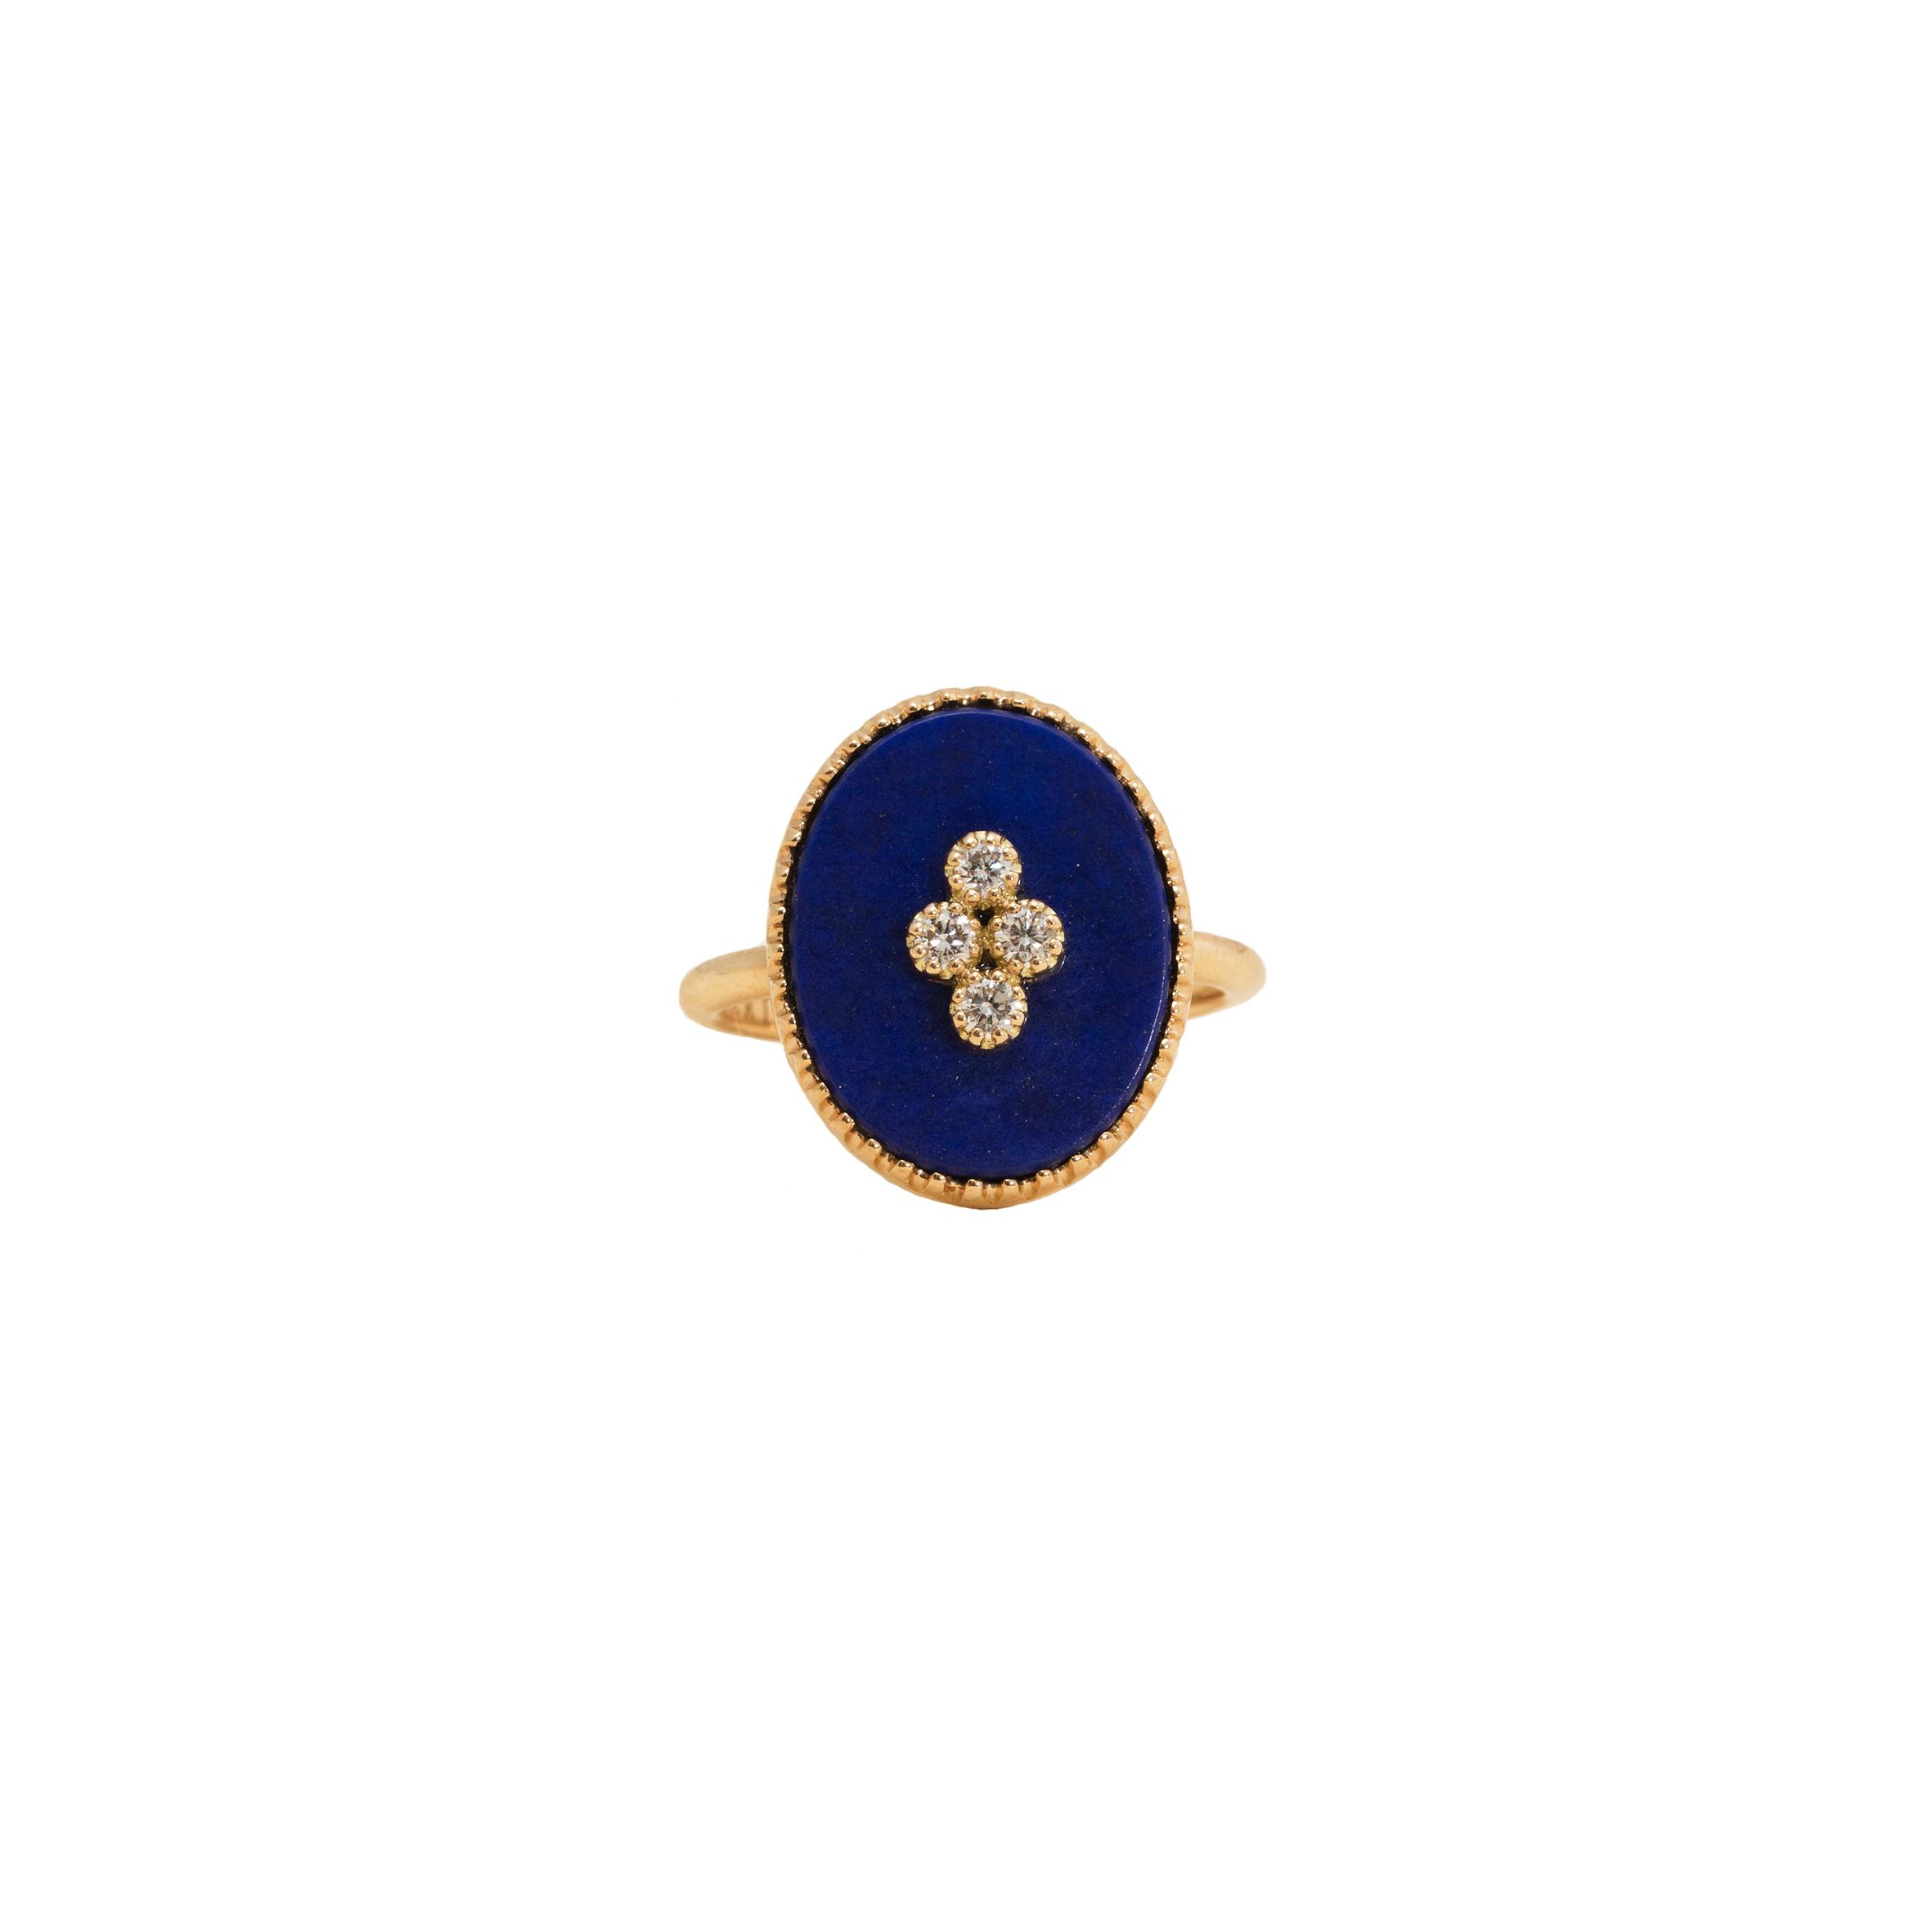 Maison Artaner La Rose des Alizes Ring